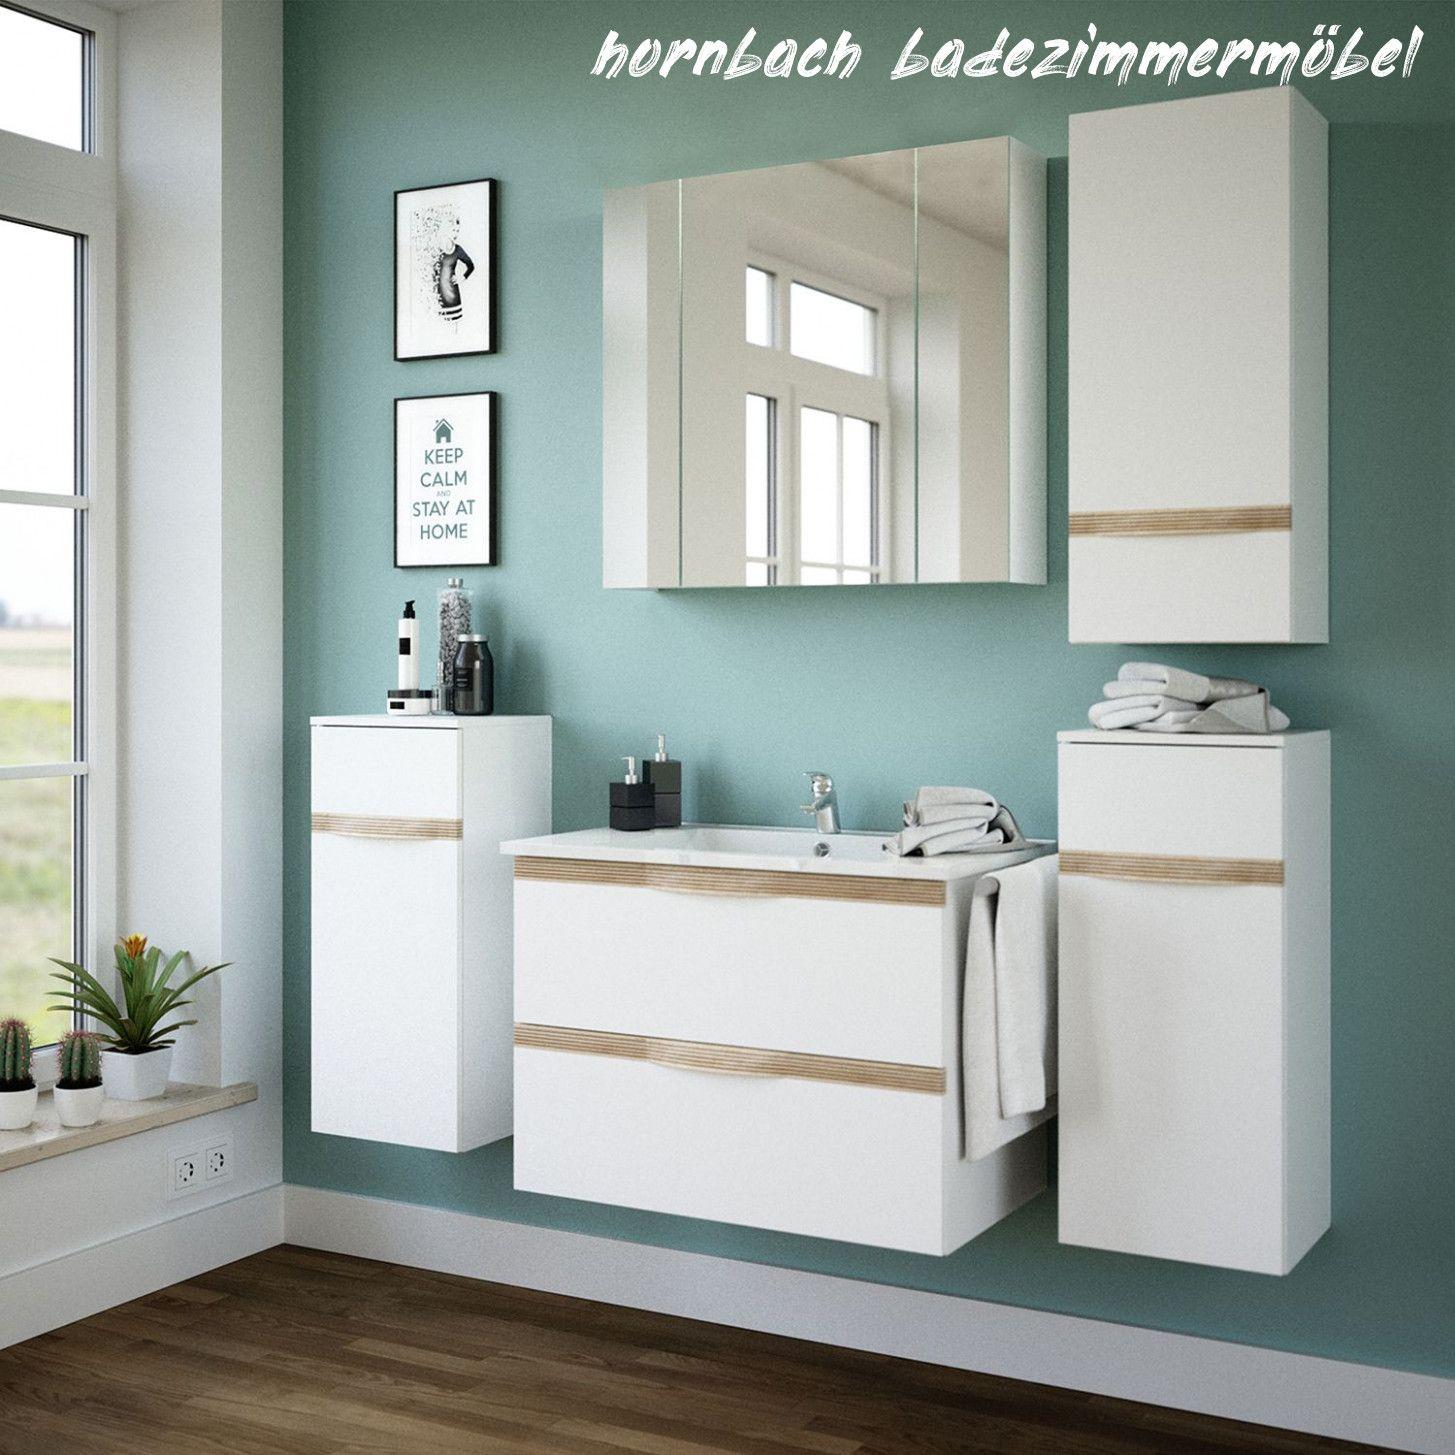 11 Hornbach Badezimmermobel In 2020 Bathroom Decor Vanity New Homes